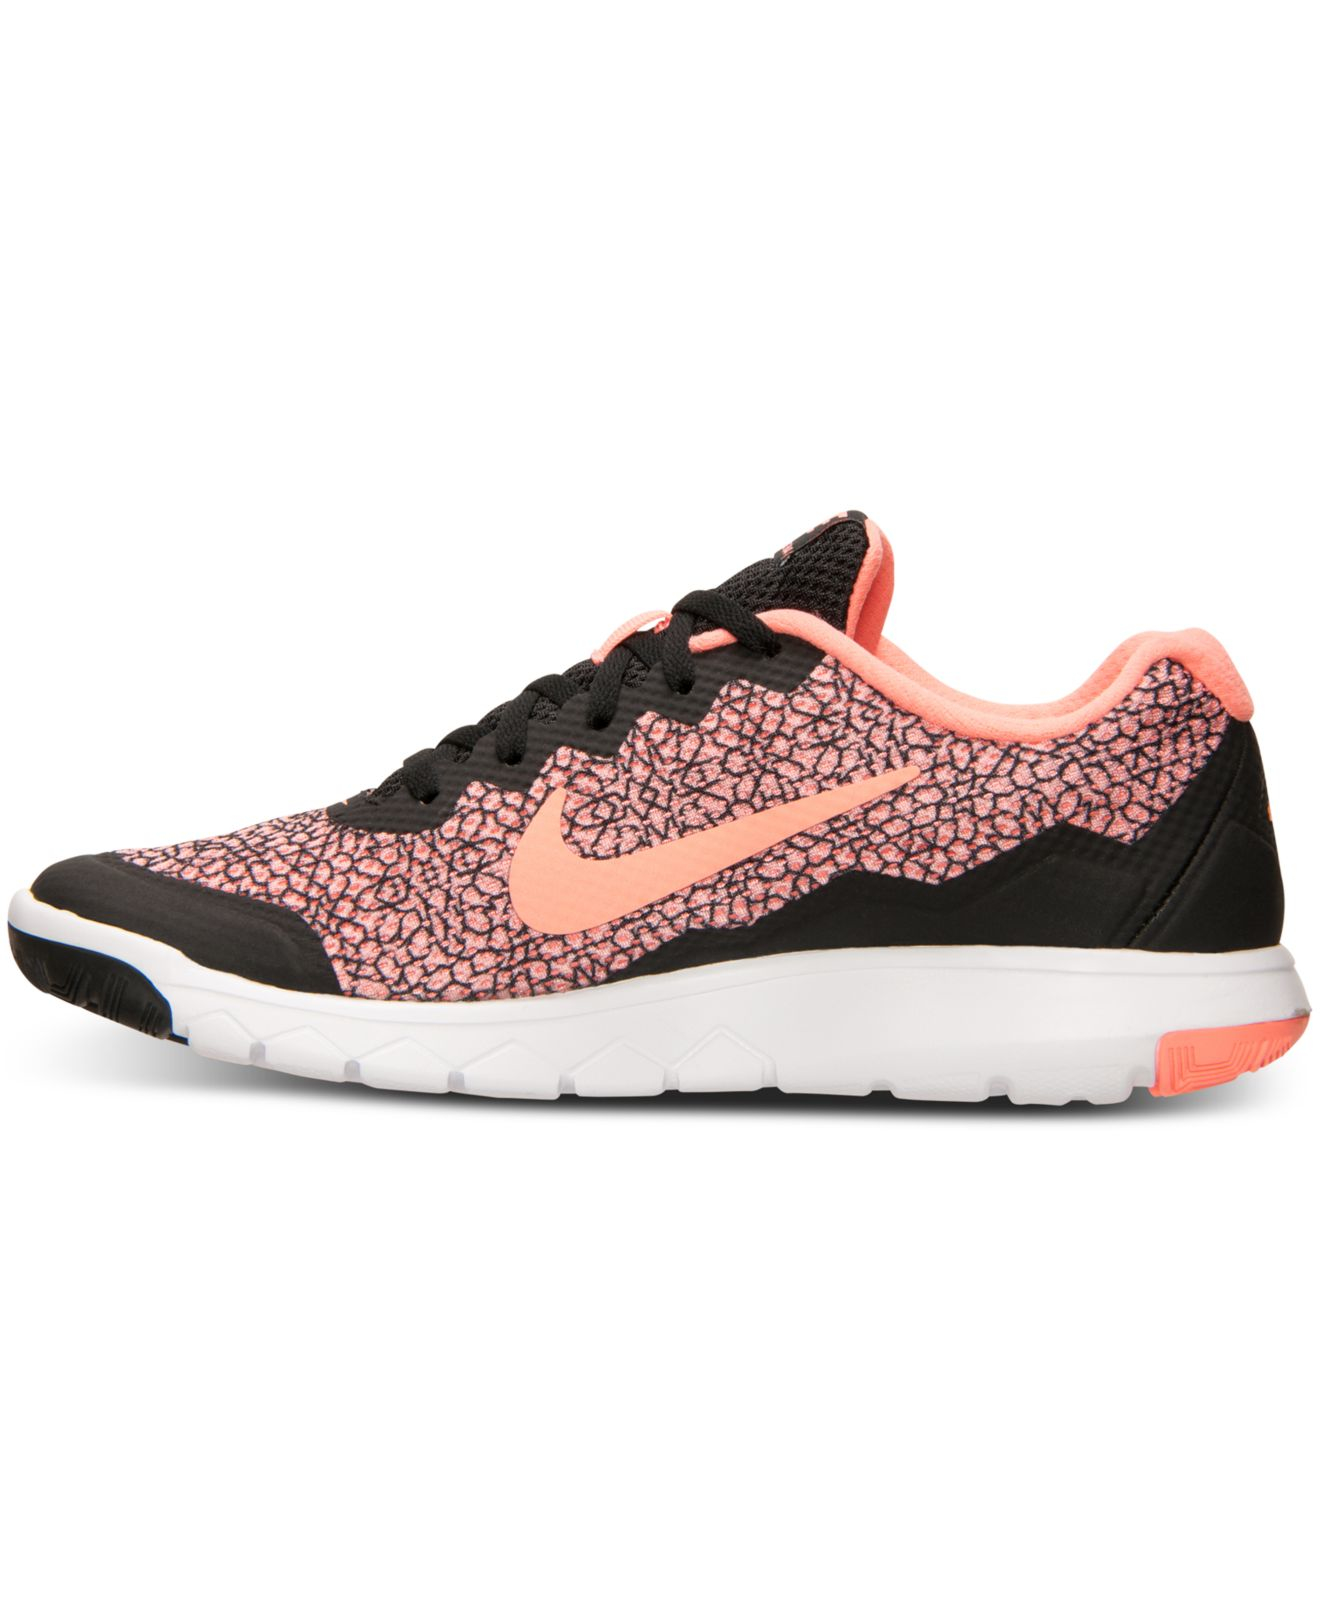 de451b3f62ca Nike Women's Flex Experience Run 4 Premium Running Sneakers From Finish  Line in Pink - Lyst